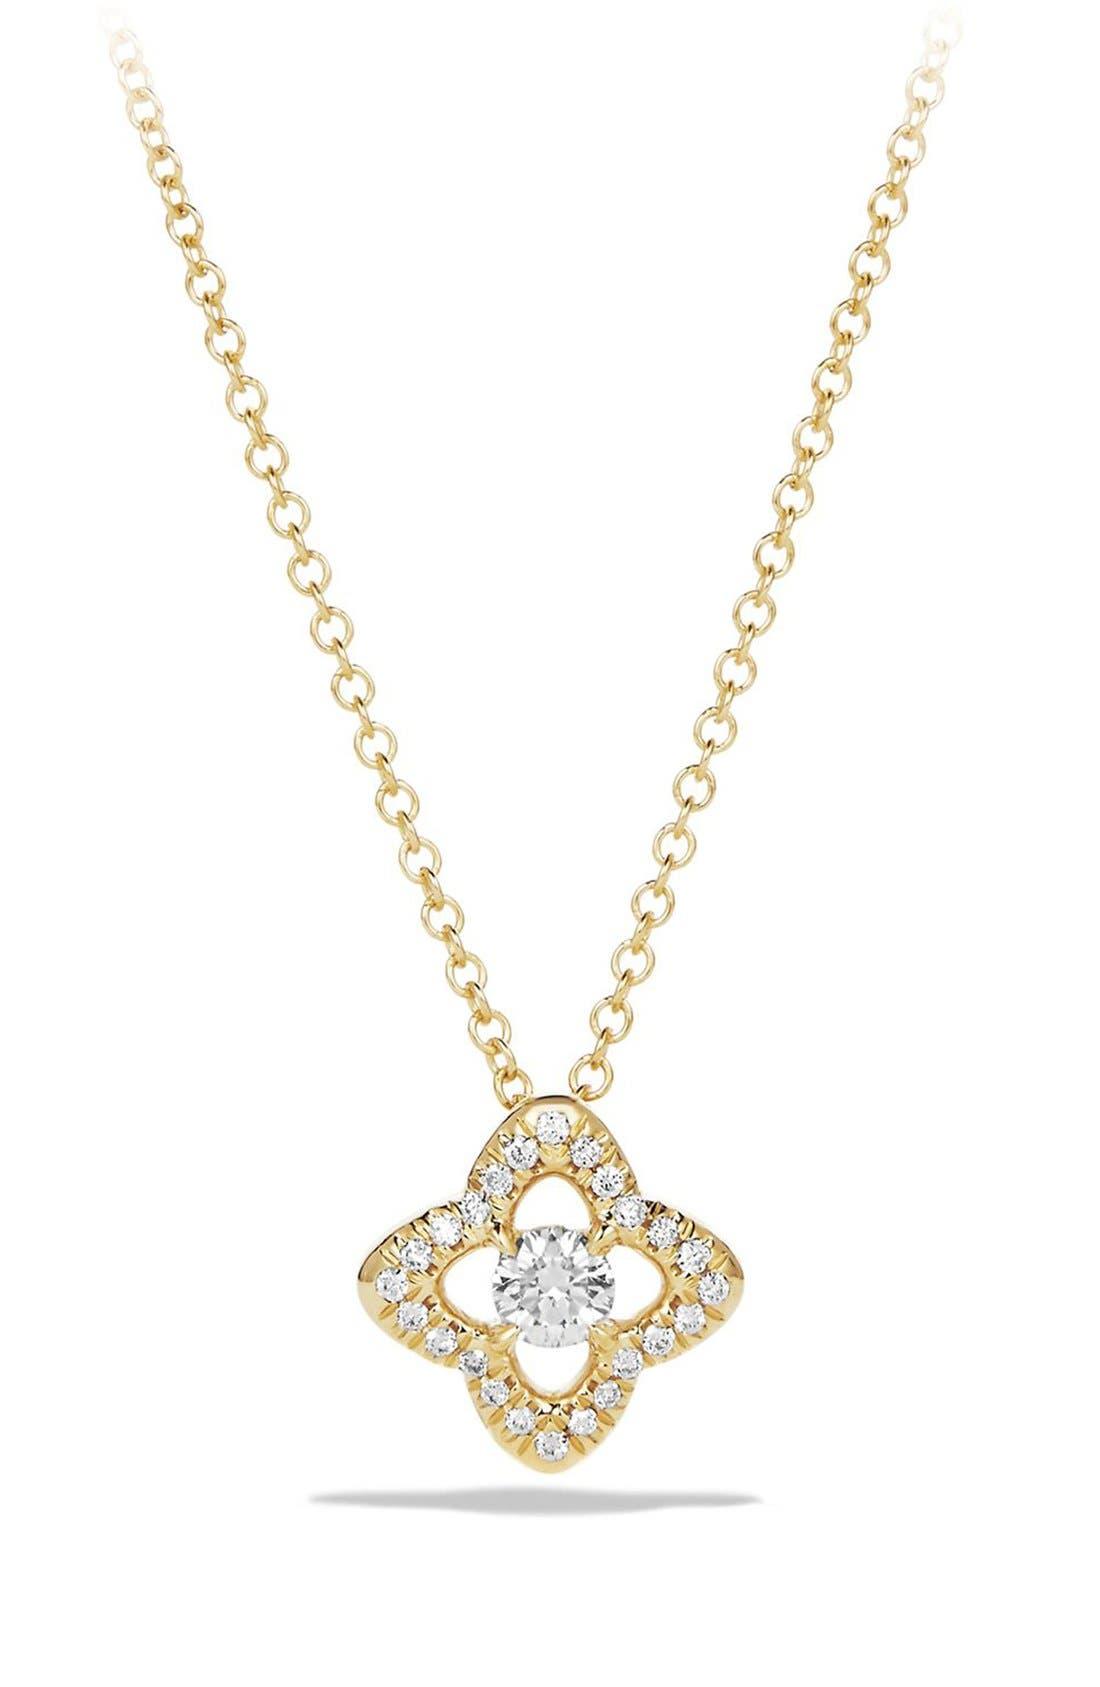 David Yurman 'Venetian Quatrefoil' Necklace with Diamonds in Gold